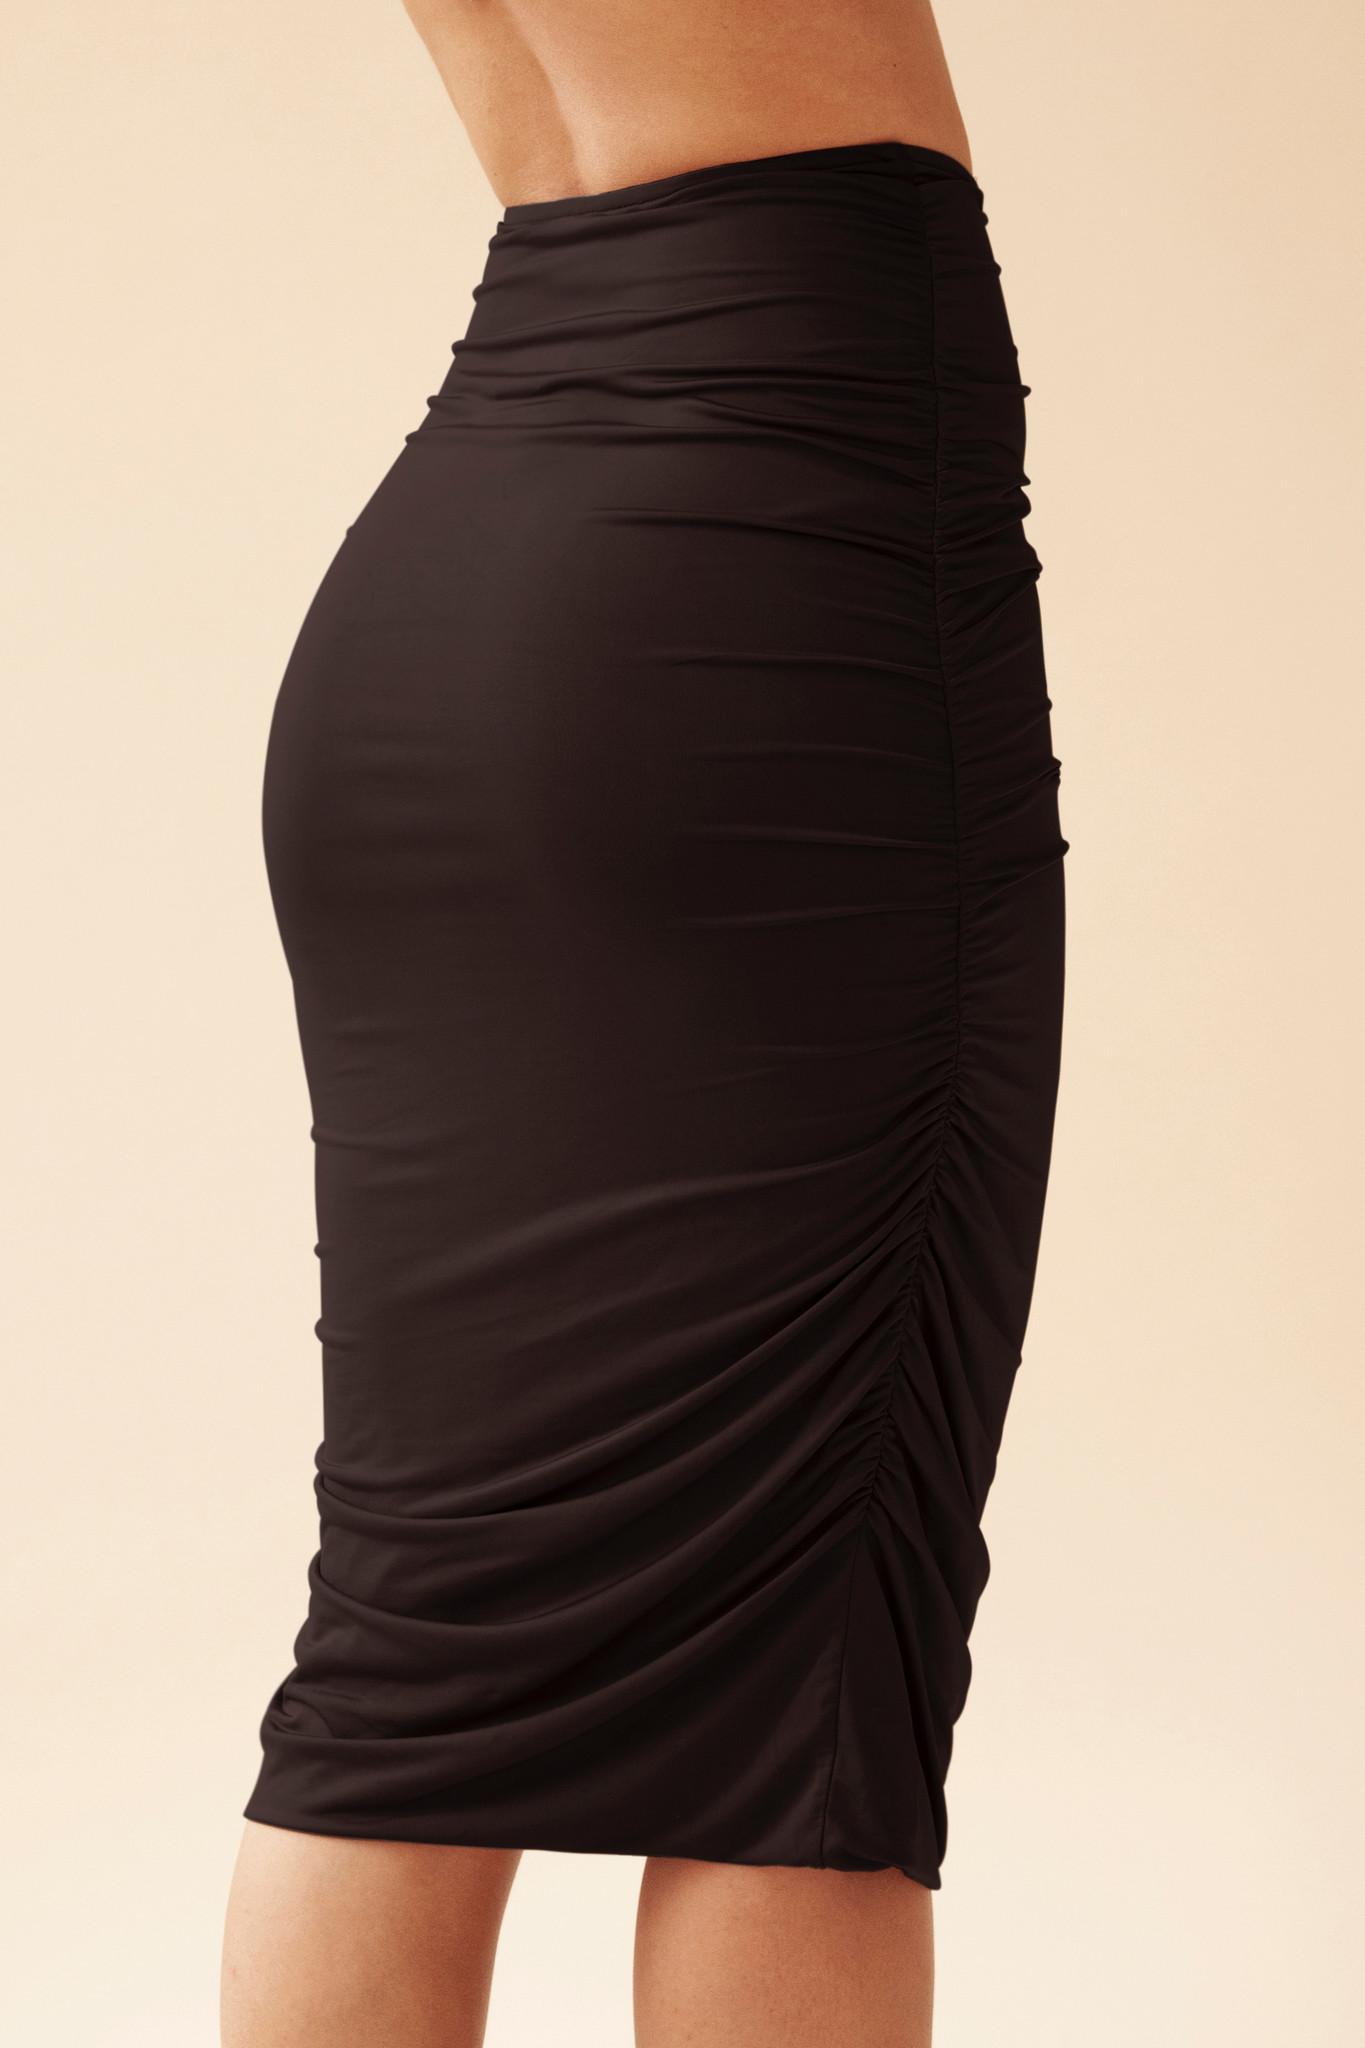 Gathered Skirt - Black-3